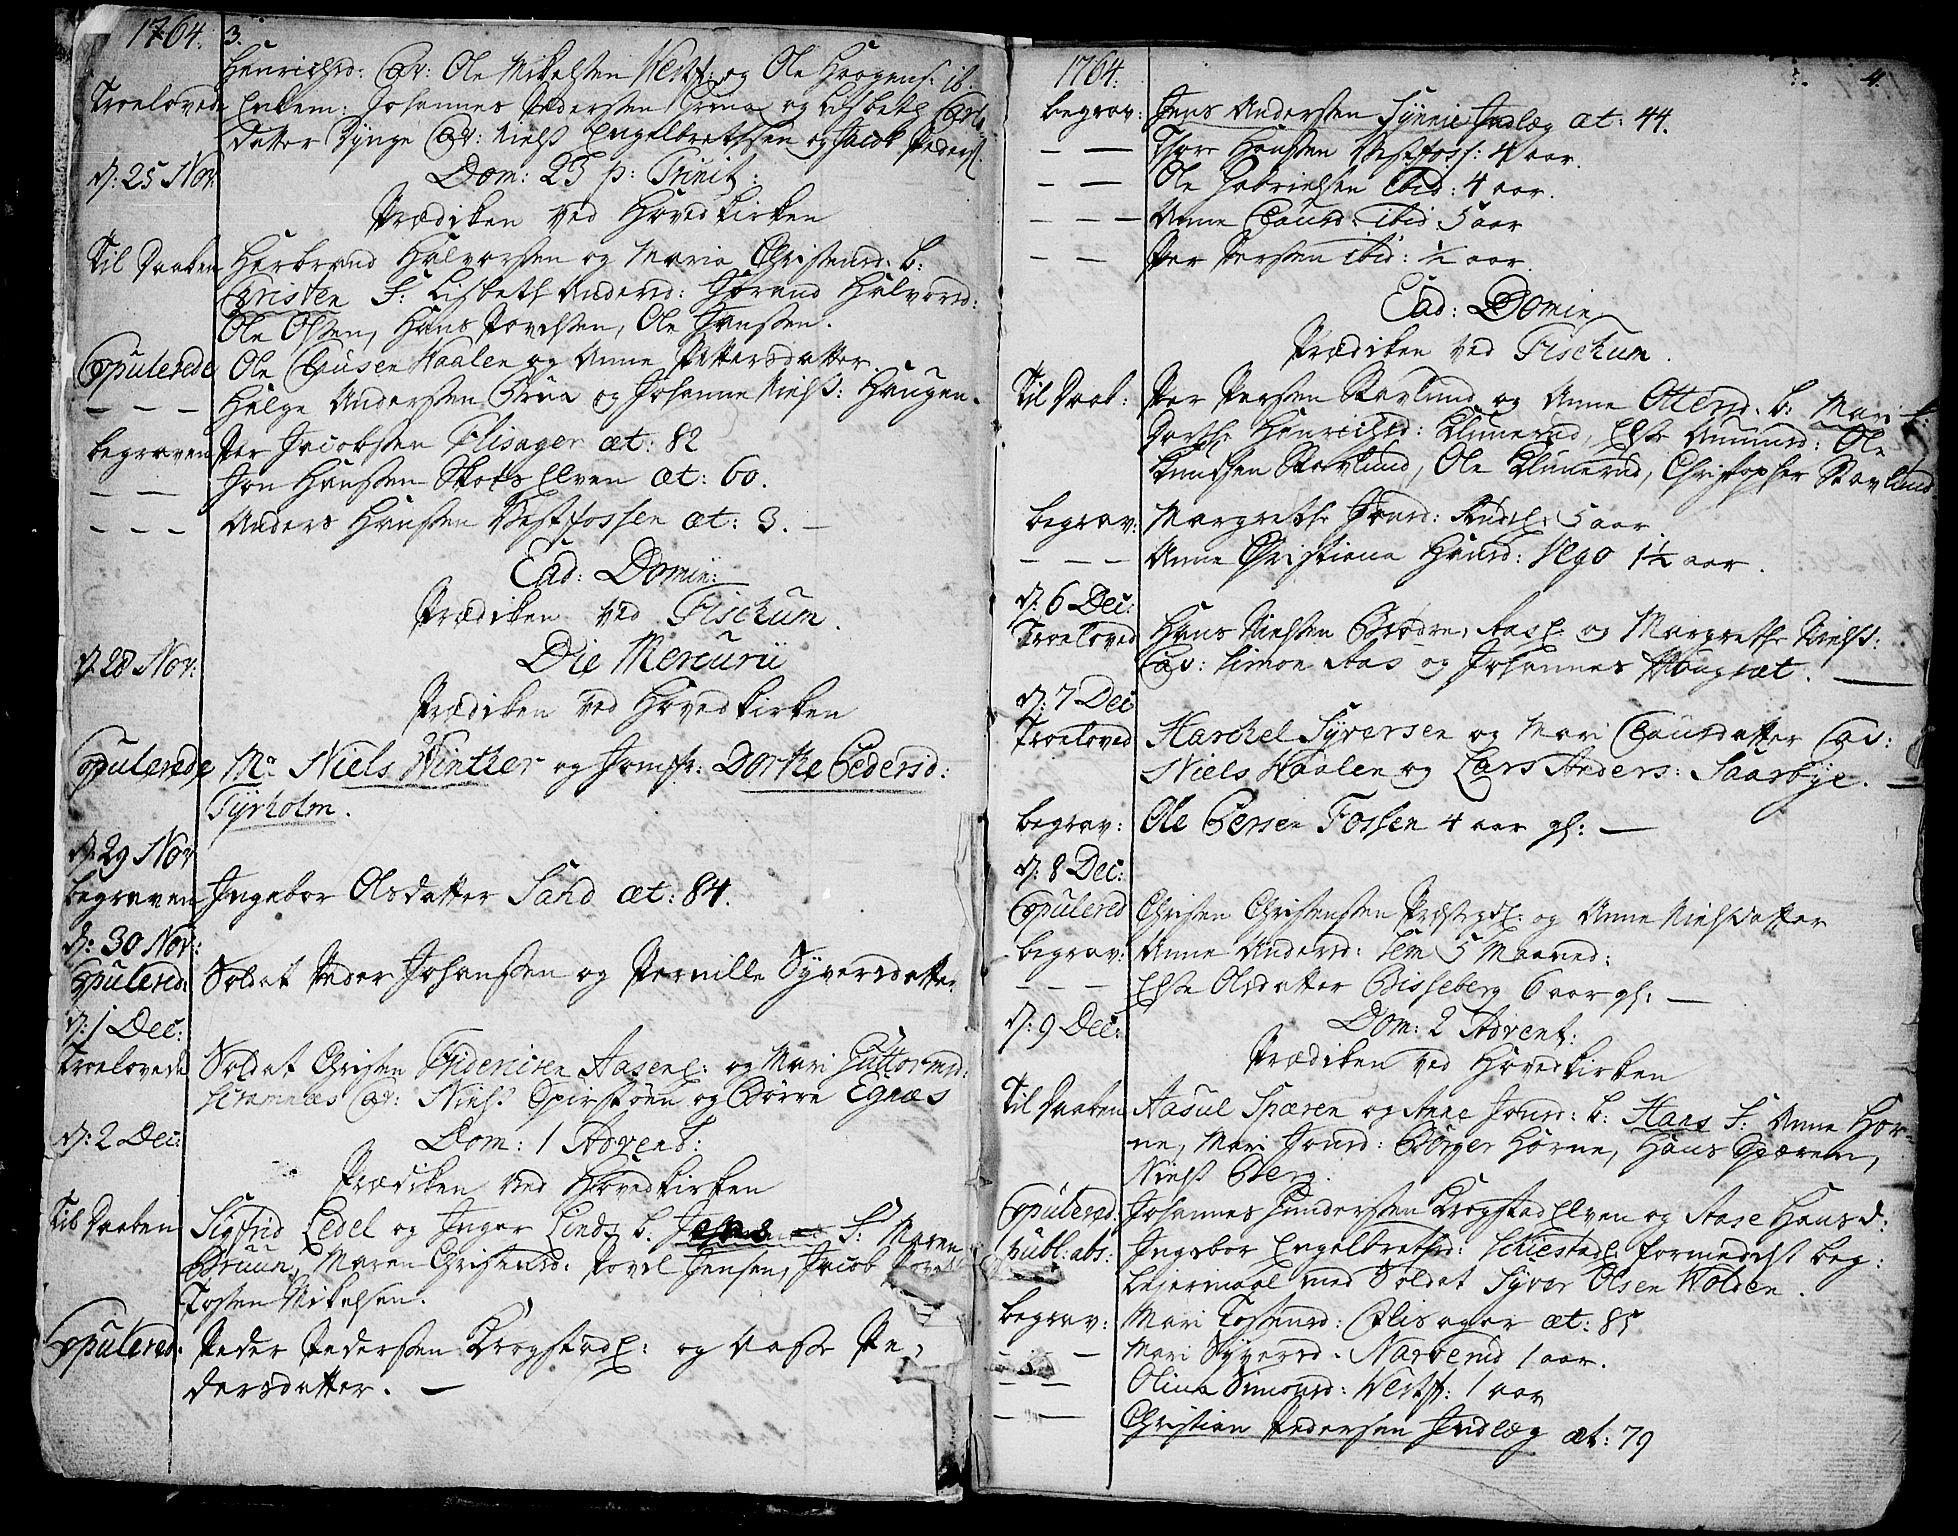 SAKO, Eiker kirkebøker, F/Fa/L0008: Ministerialbok nr. I 8, 1764-1788, s. 5-6